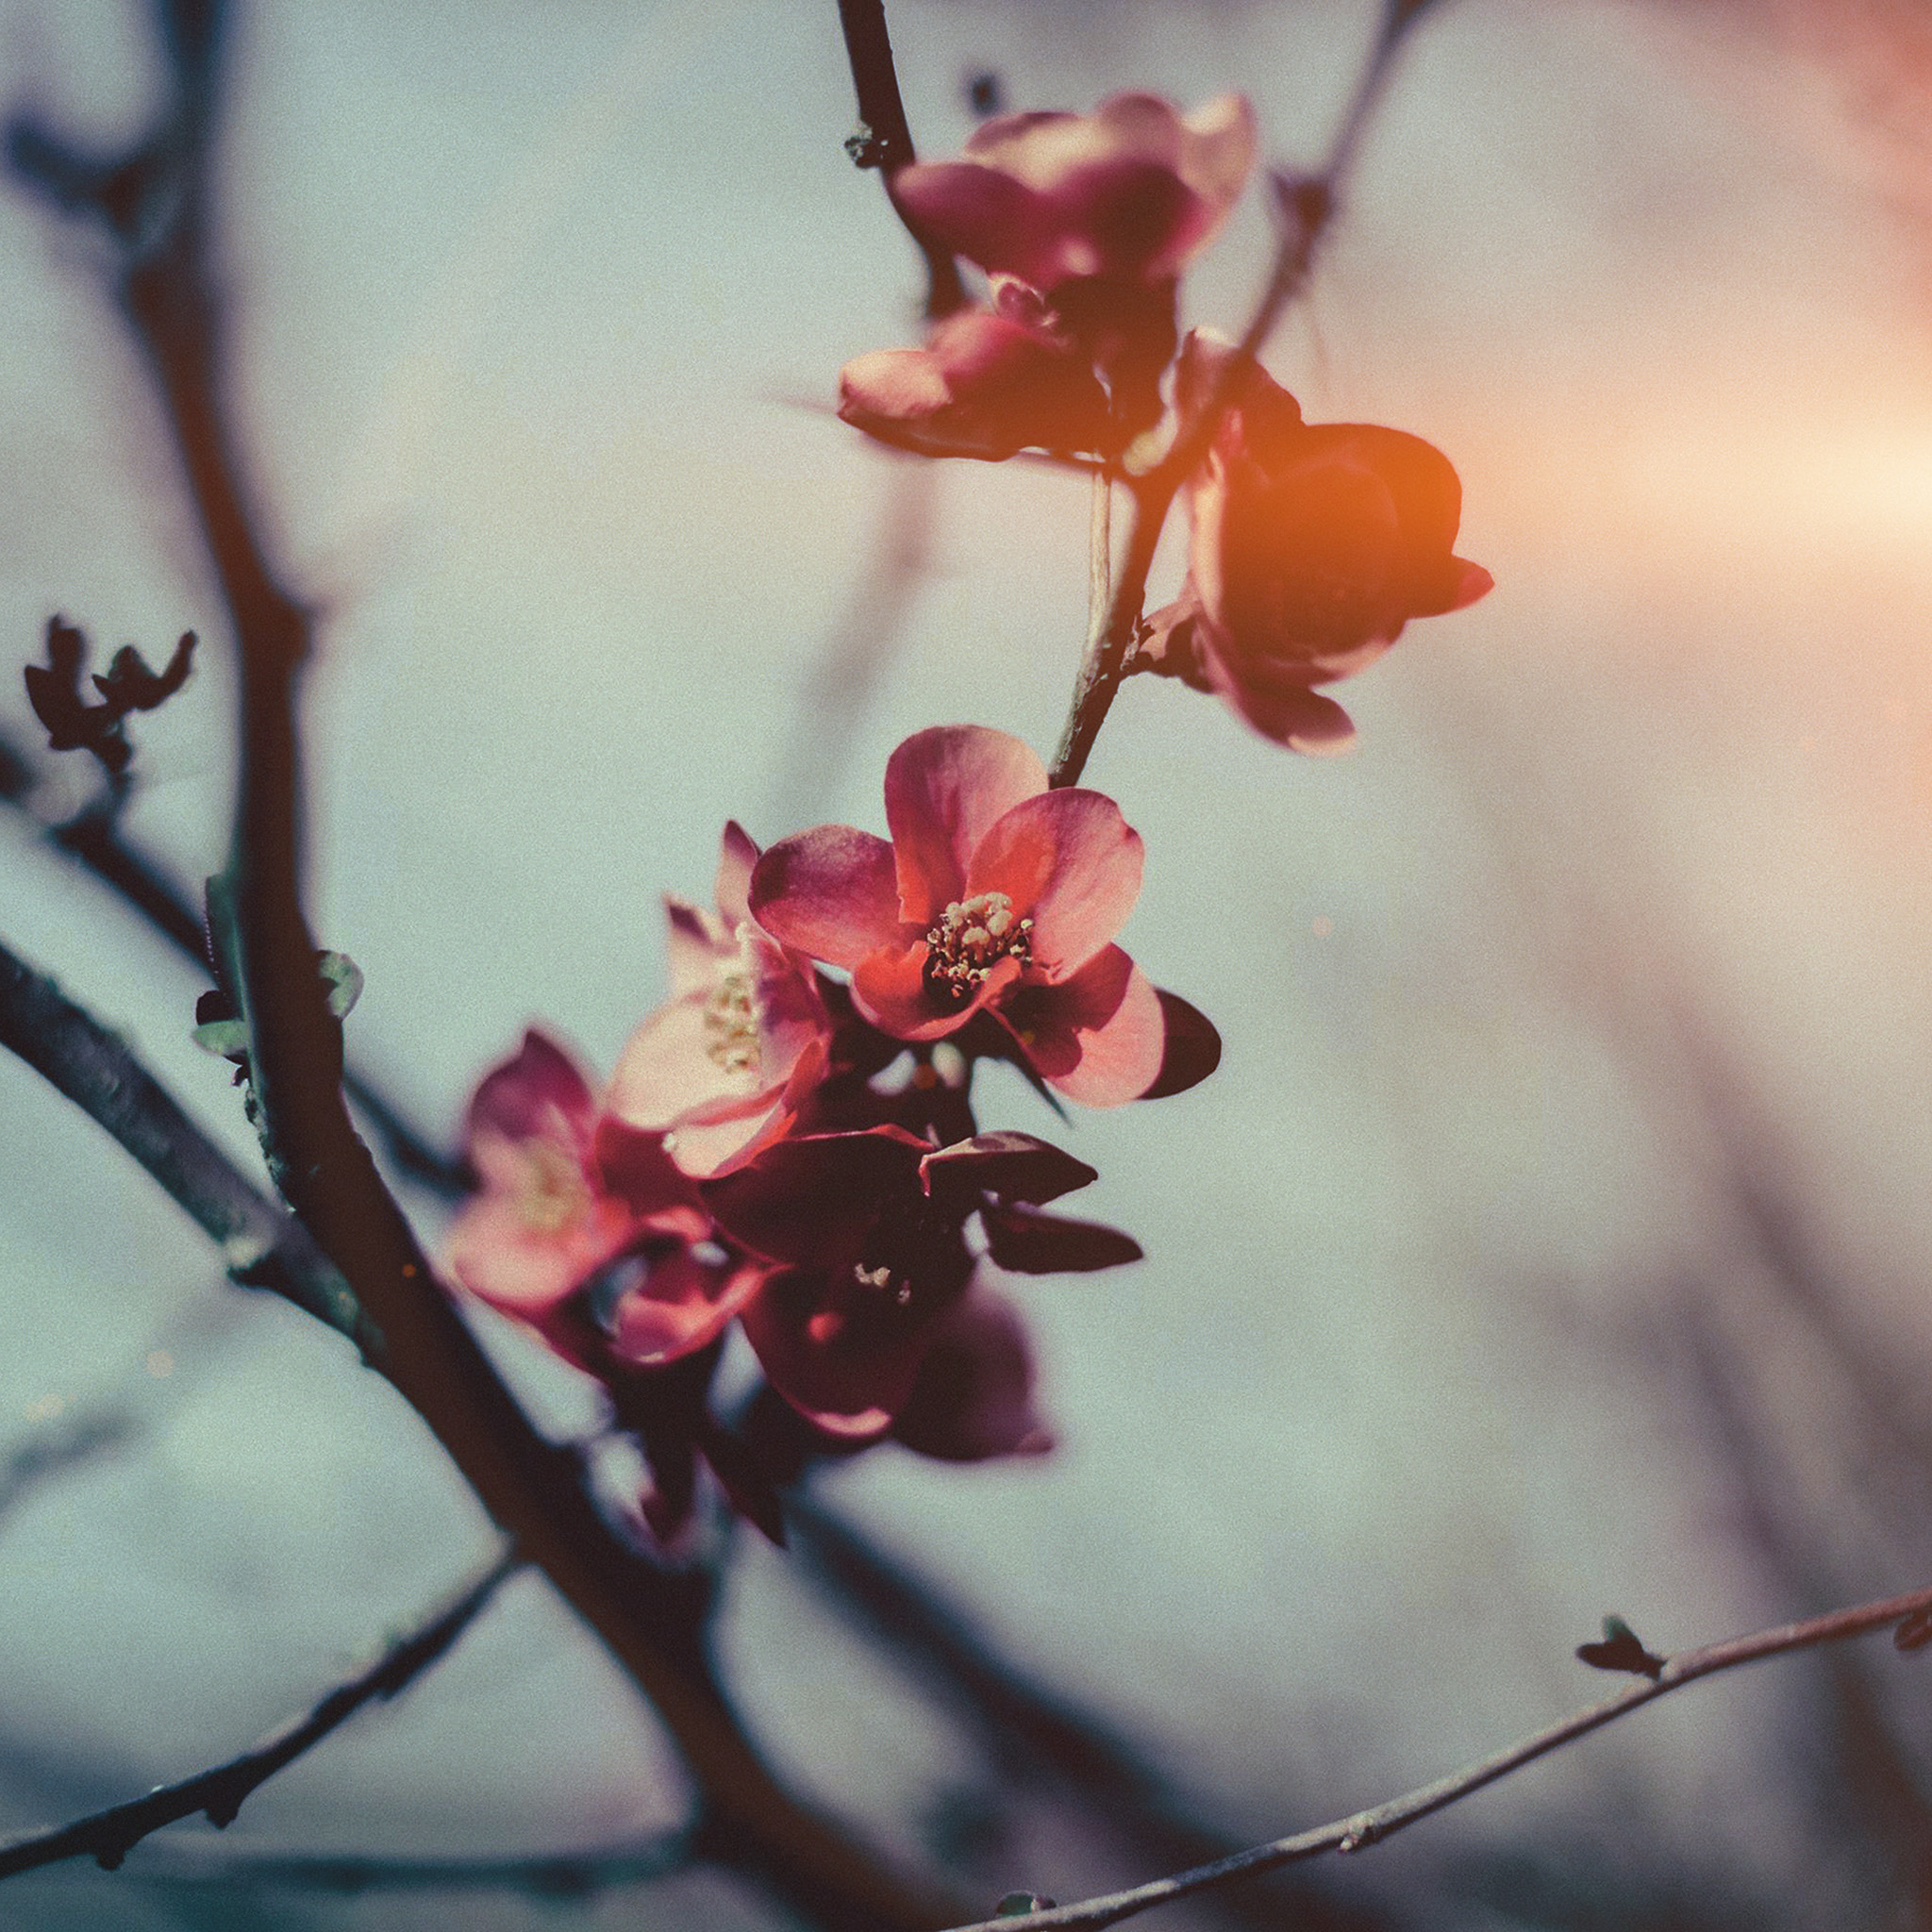 29+ Wallpaper Spring Blossom Flowers Images